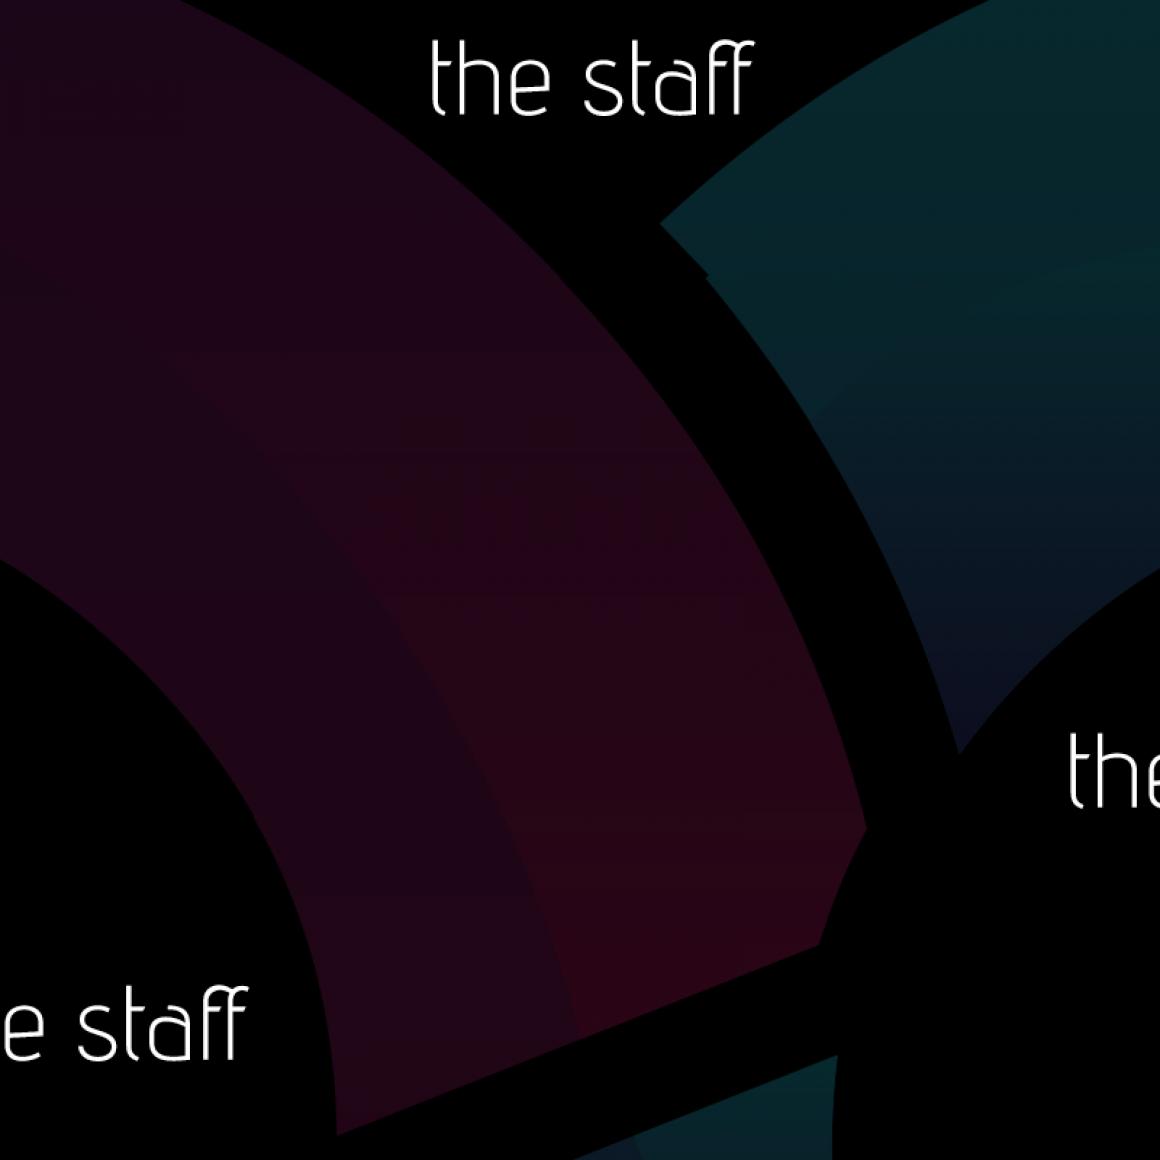 theStaff_02